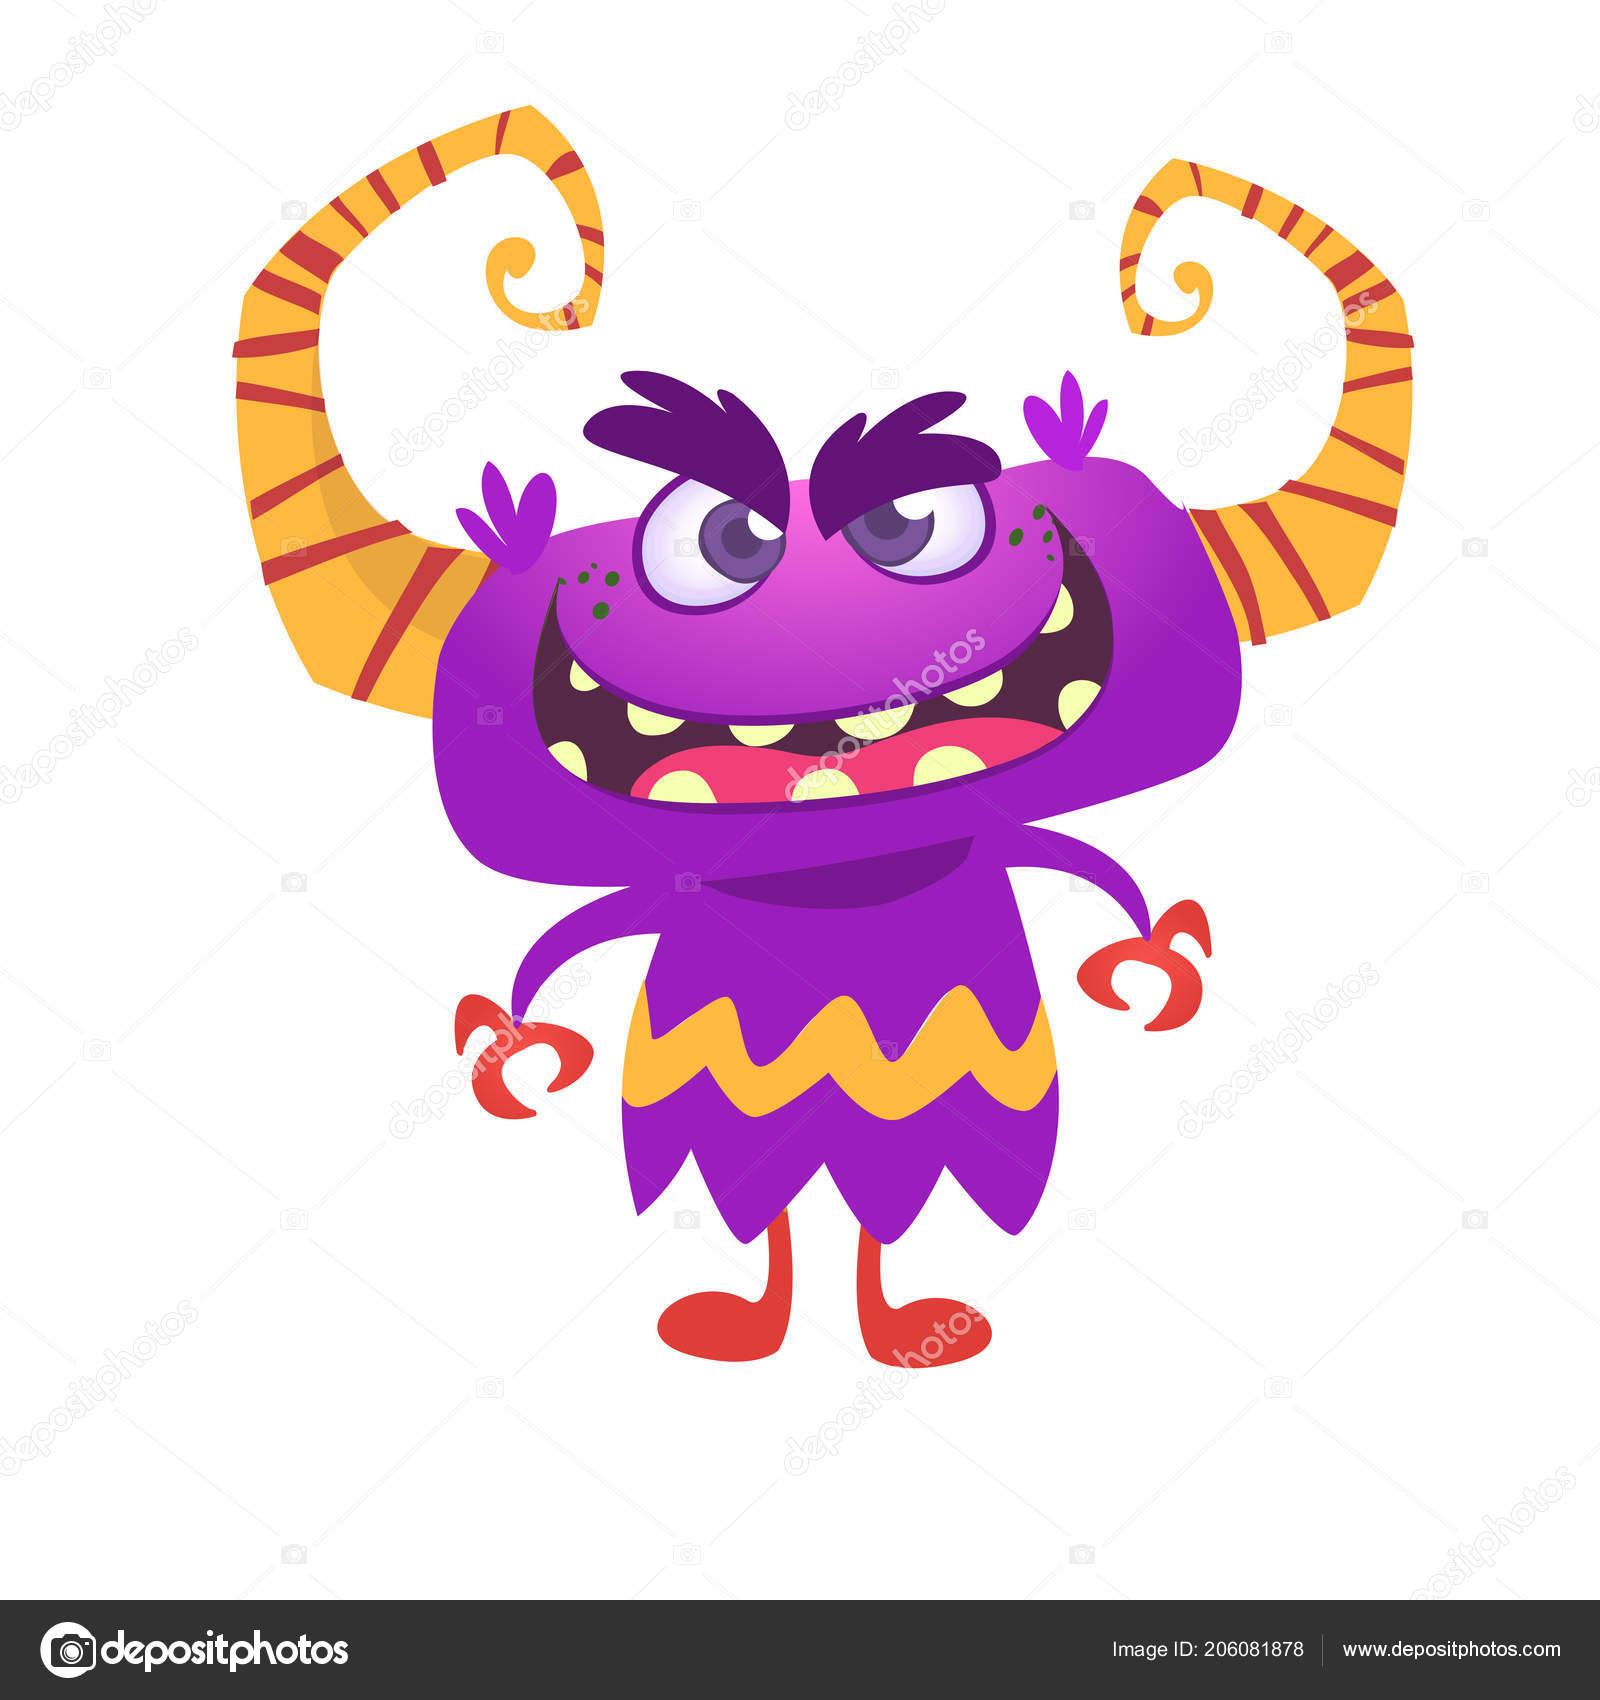 Angry Cartoon Monster Horns Vector Illustration Stock Vector C Drawkman Gmail Com 206081878